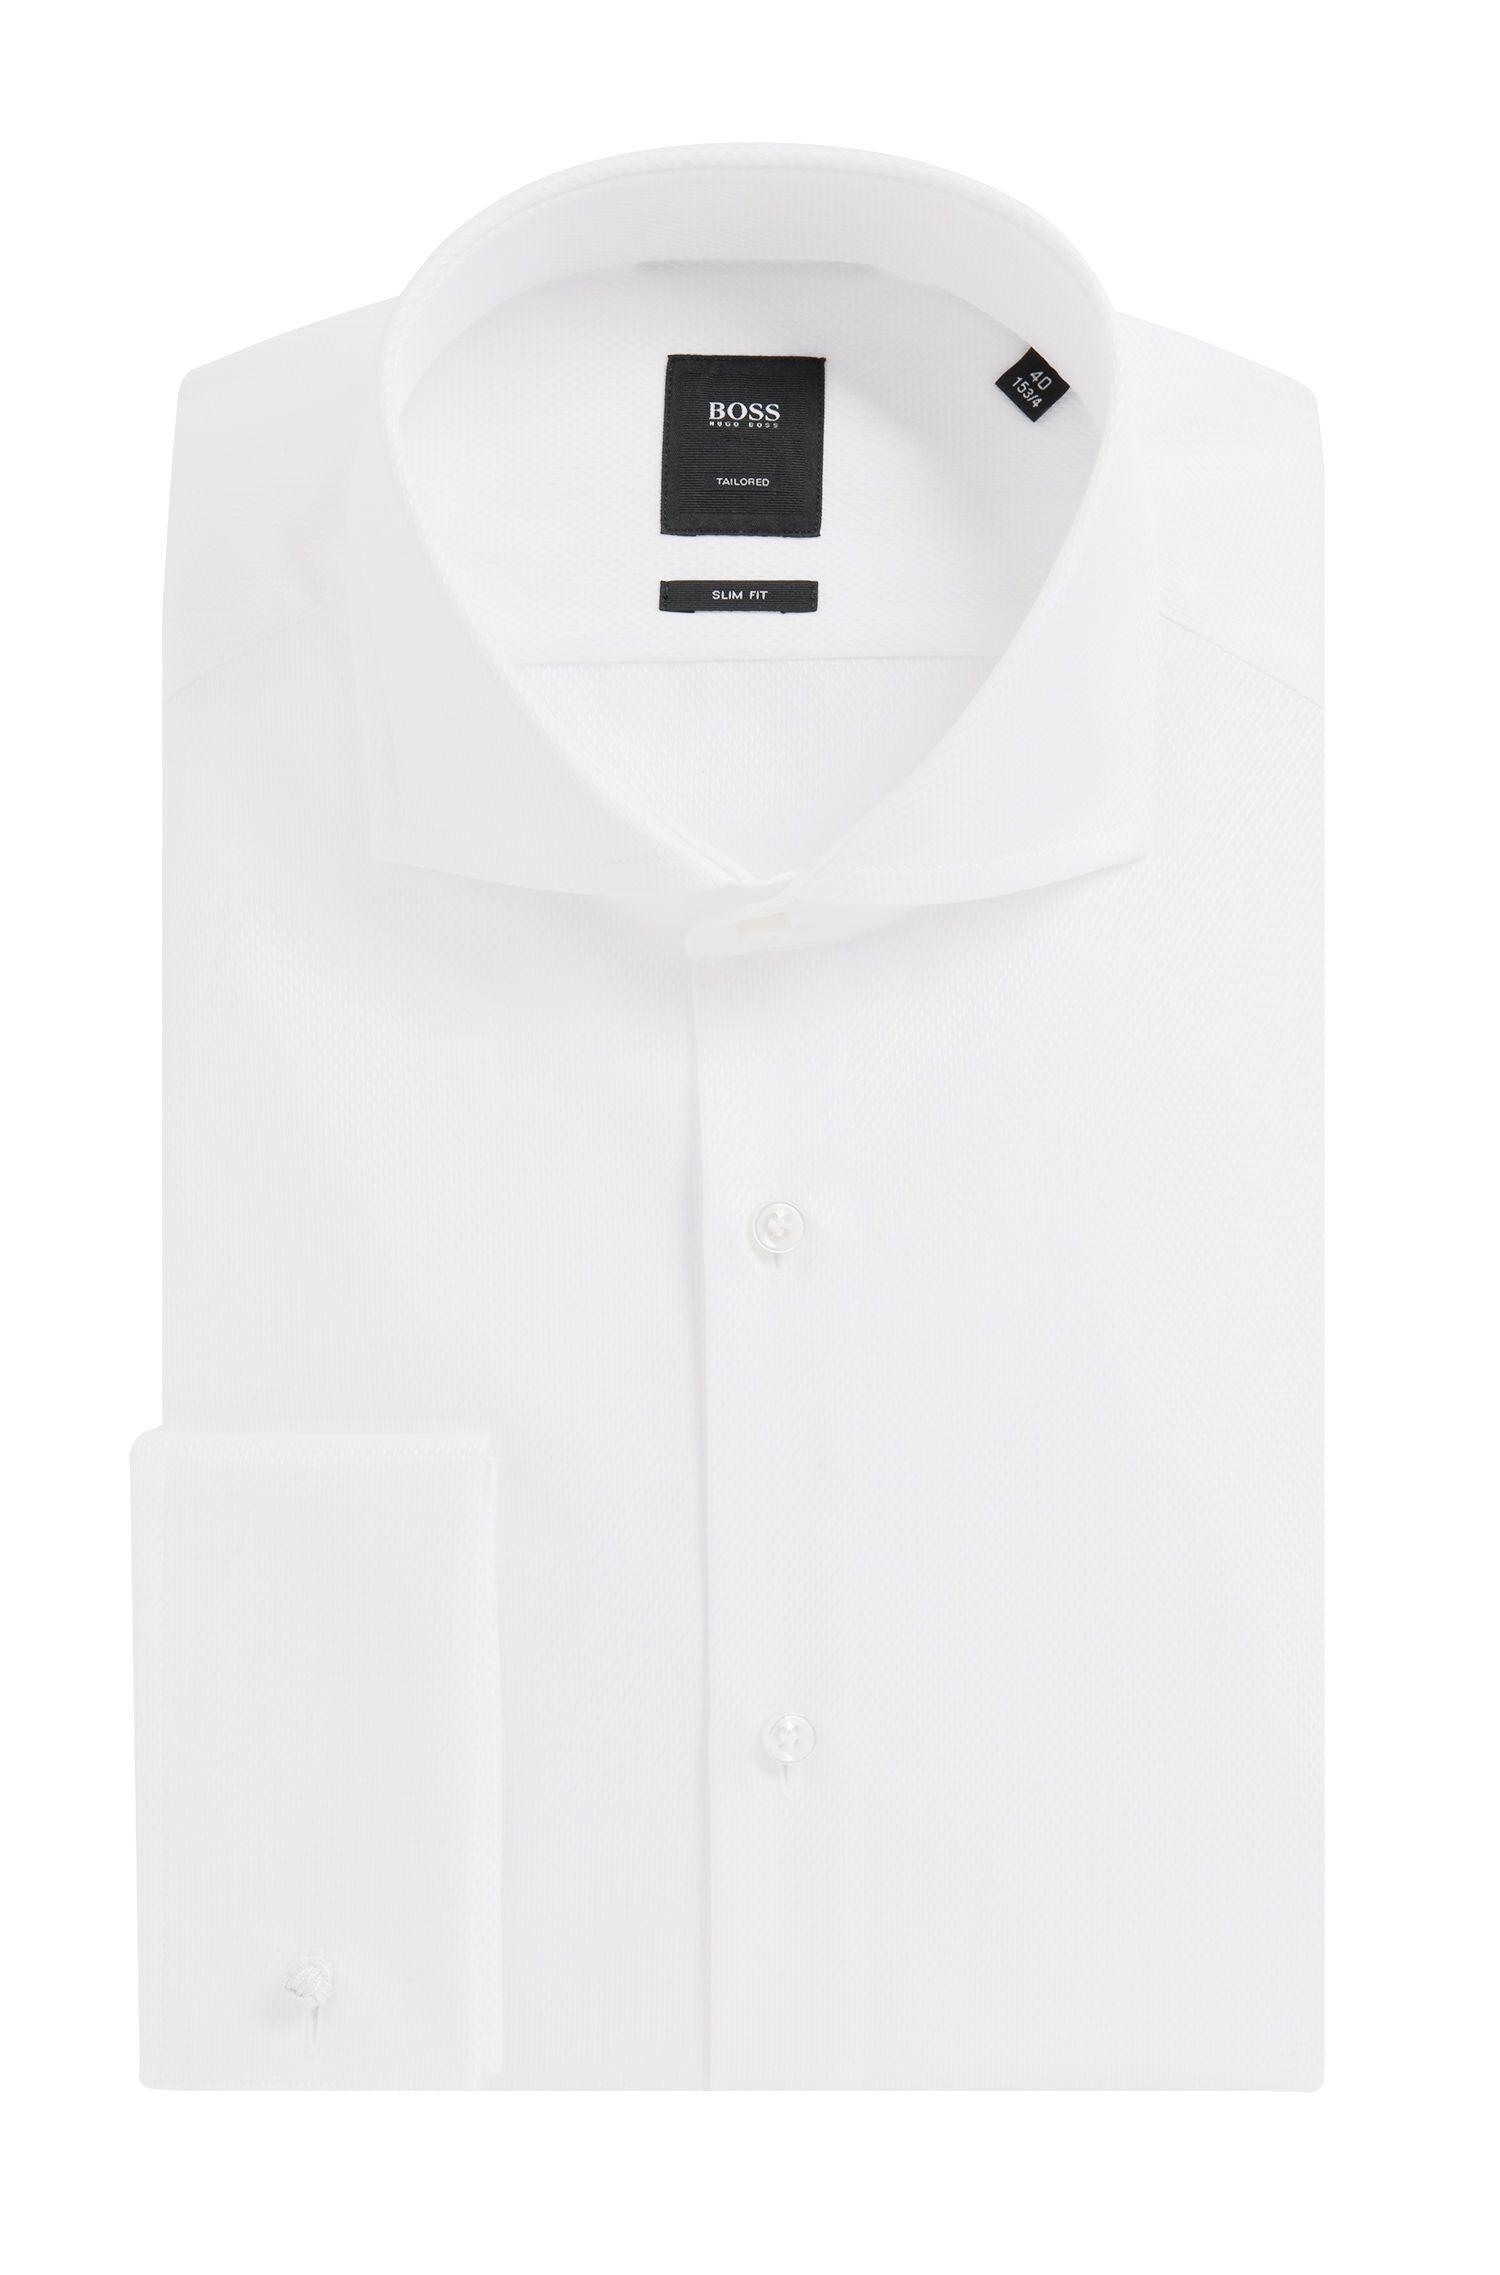 'T-Yacob' | Slim Fit, Italian Cotton Textured Dress Shirt